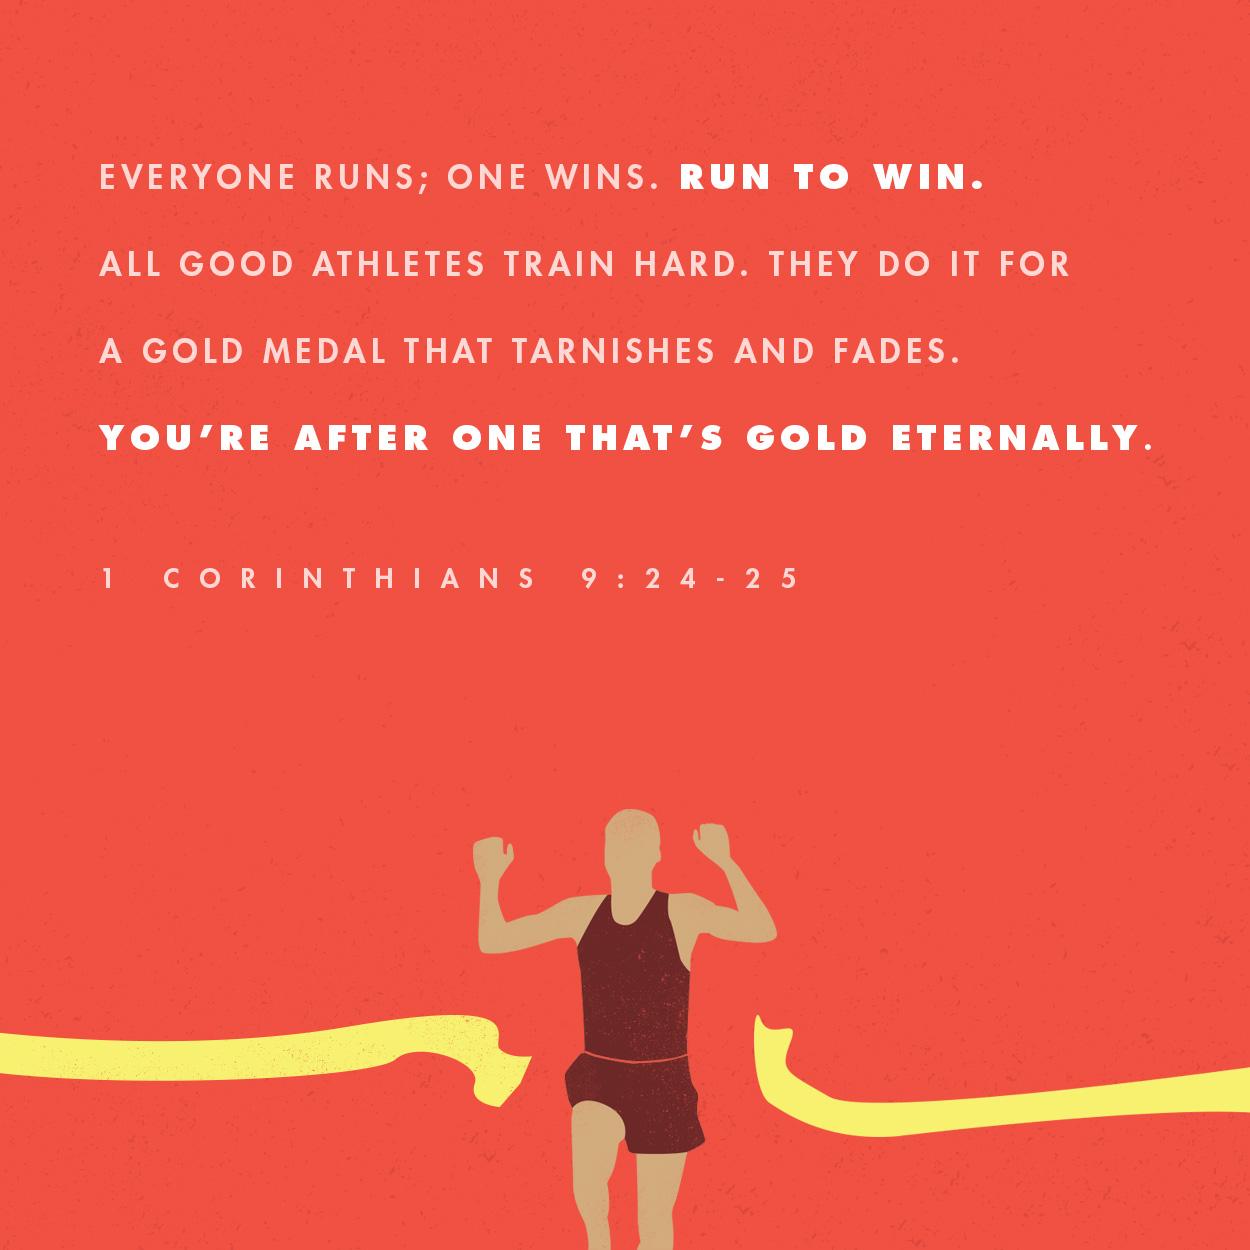 Olympics-verse-image